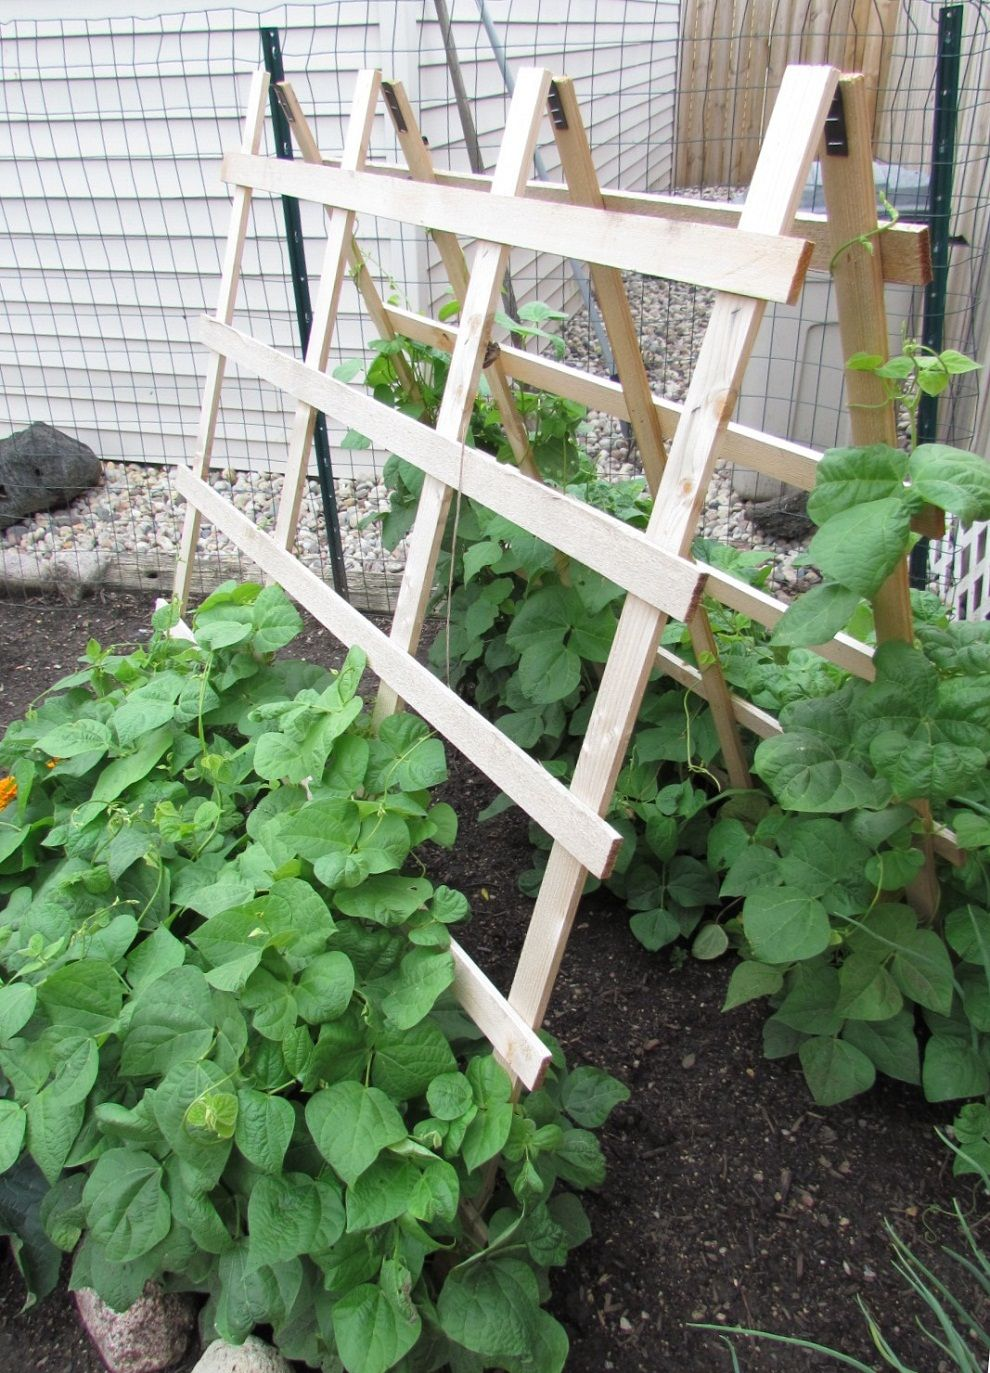 Green Bean Trellis Ideas Part - 26: Green Bean Trellis Wooden Tripod